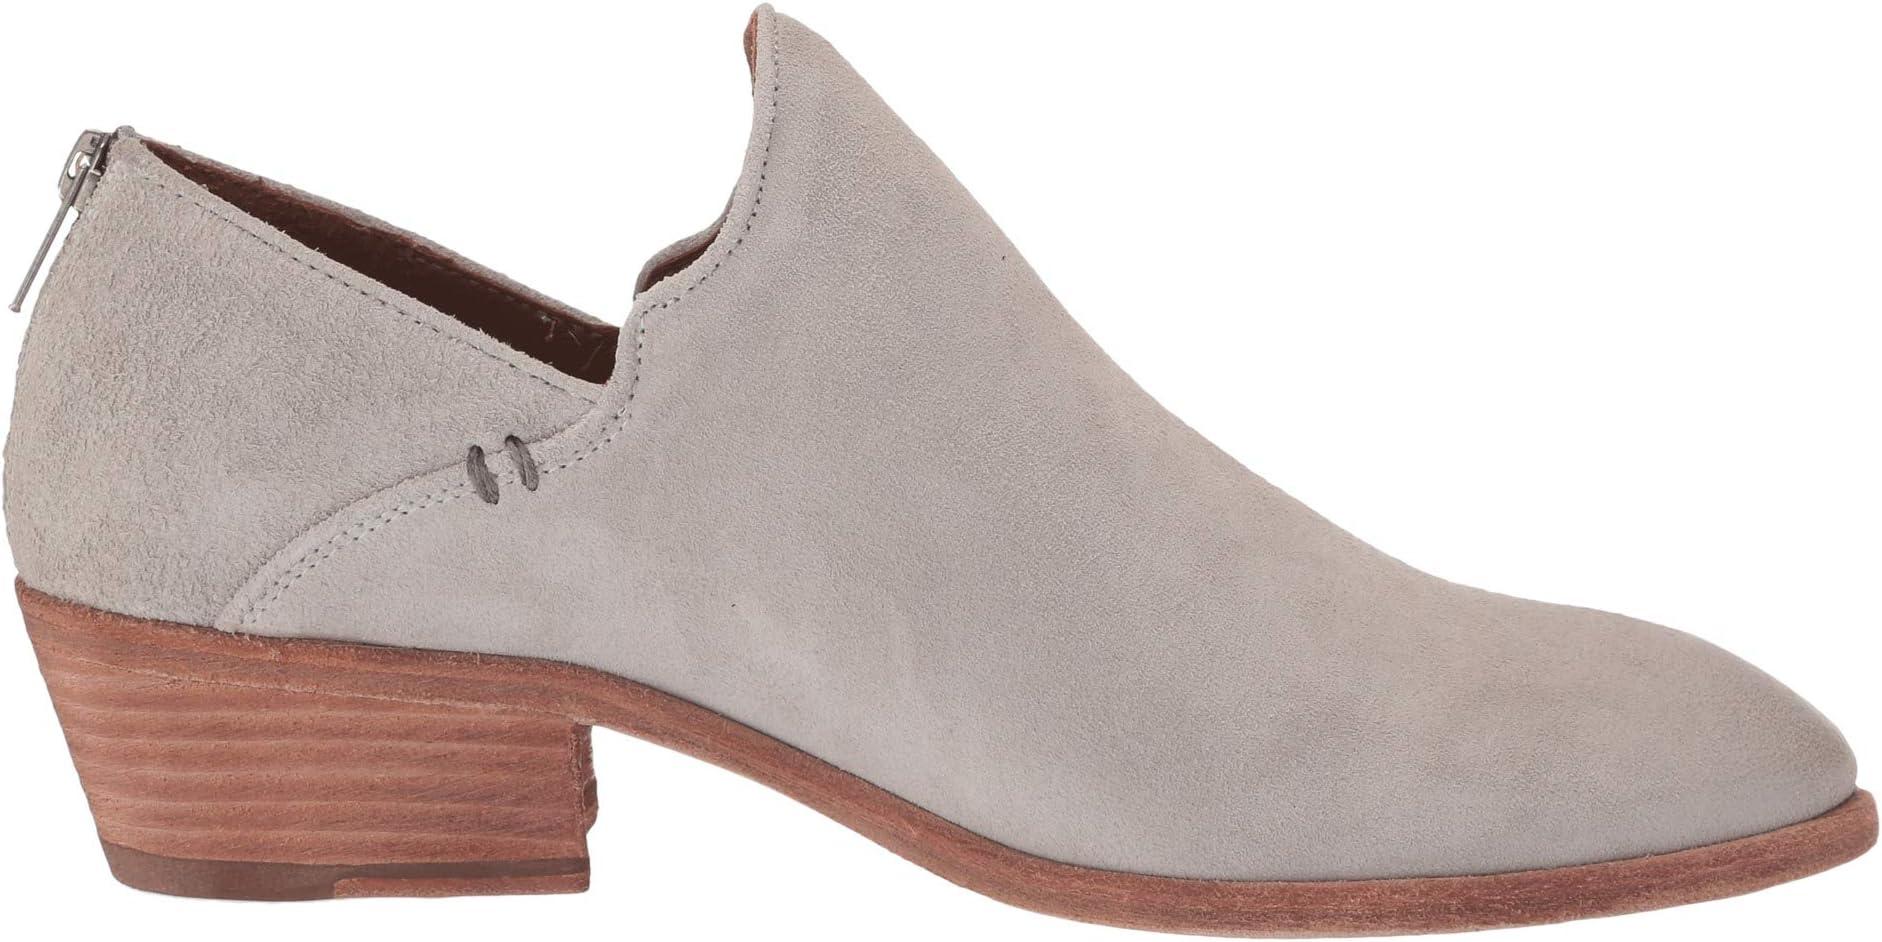 Frye Carson Shootie   Women's shoes   2020 Newest